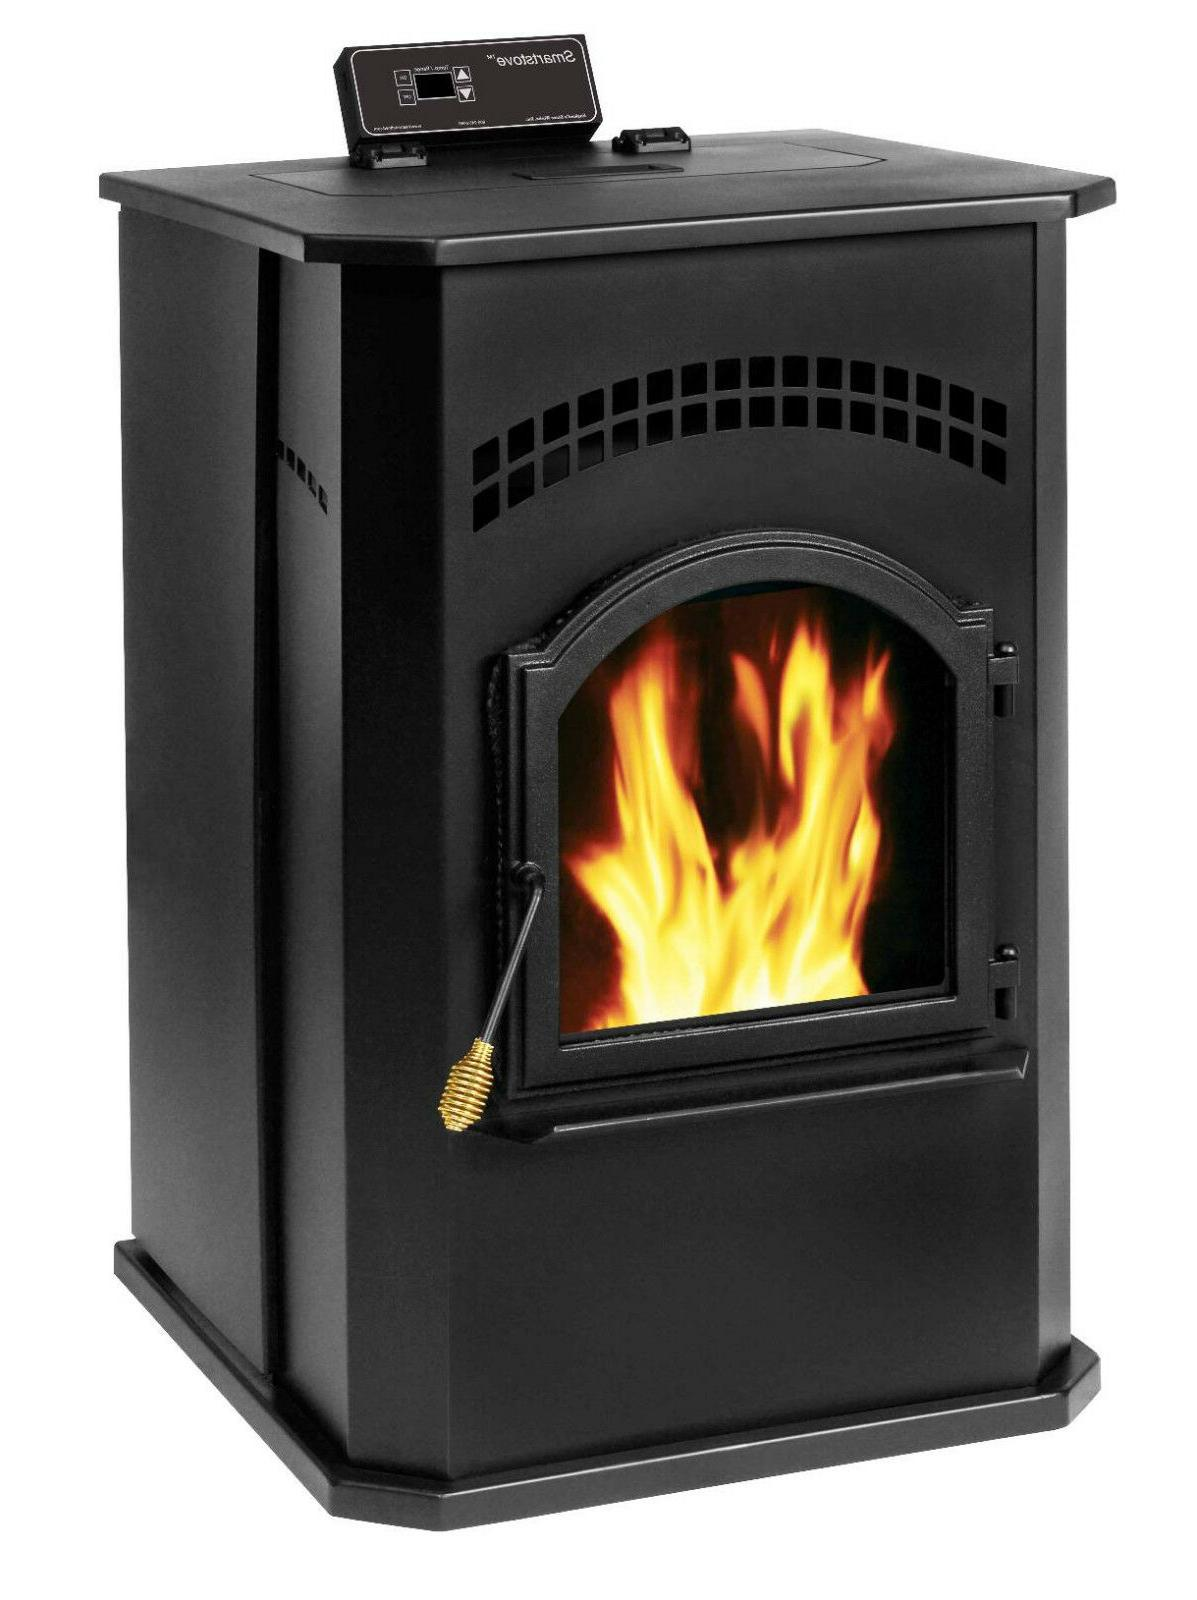 55 trpcb120 epa certified pellet stove auto